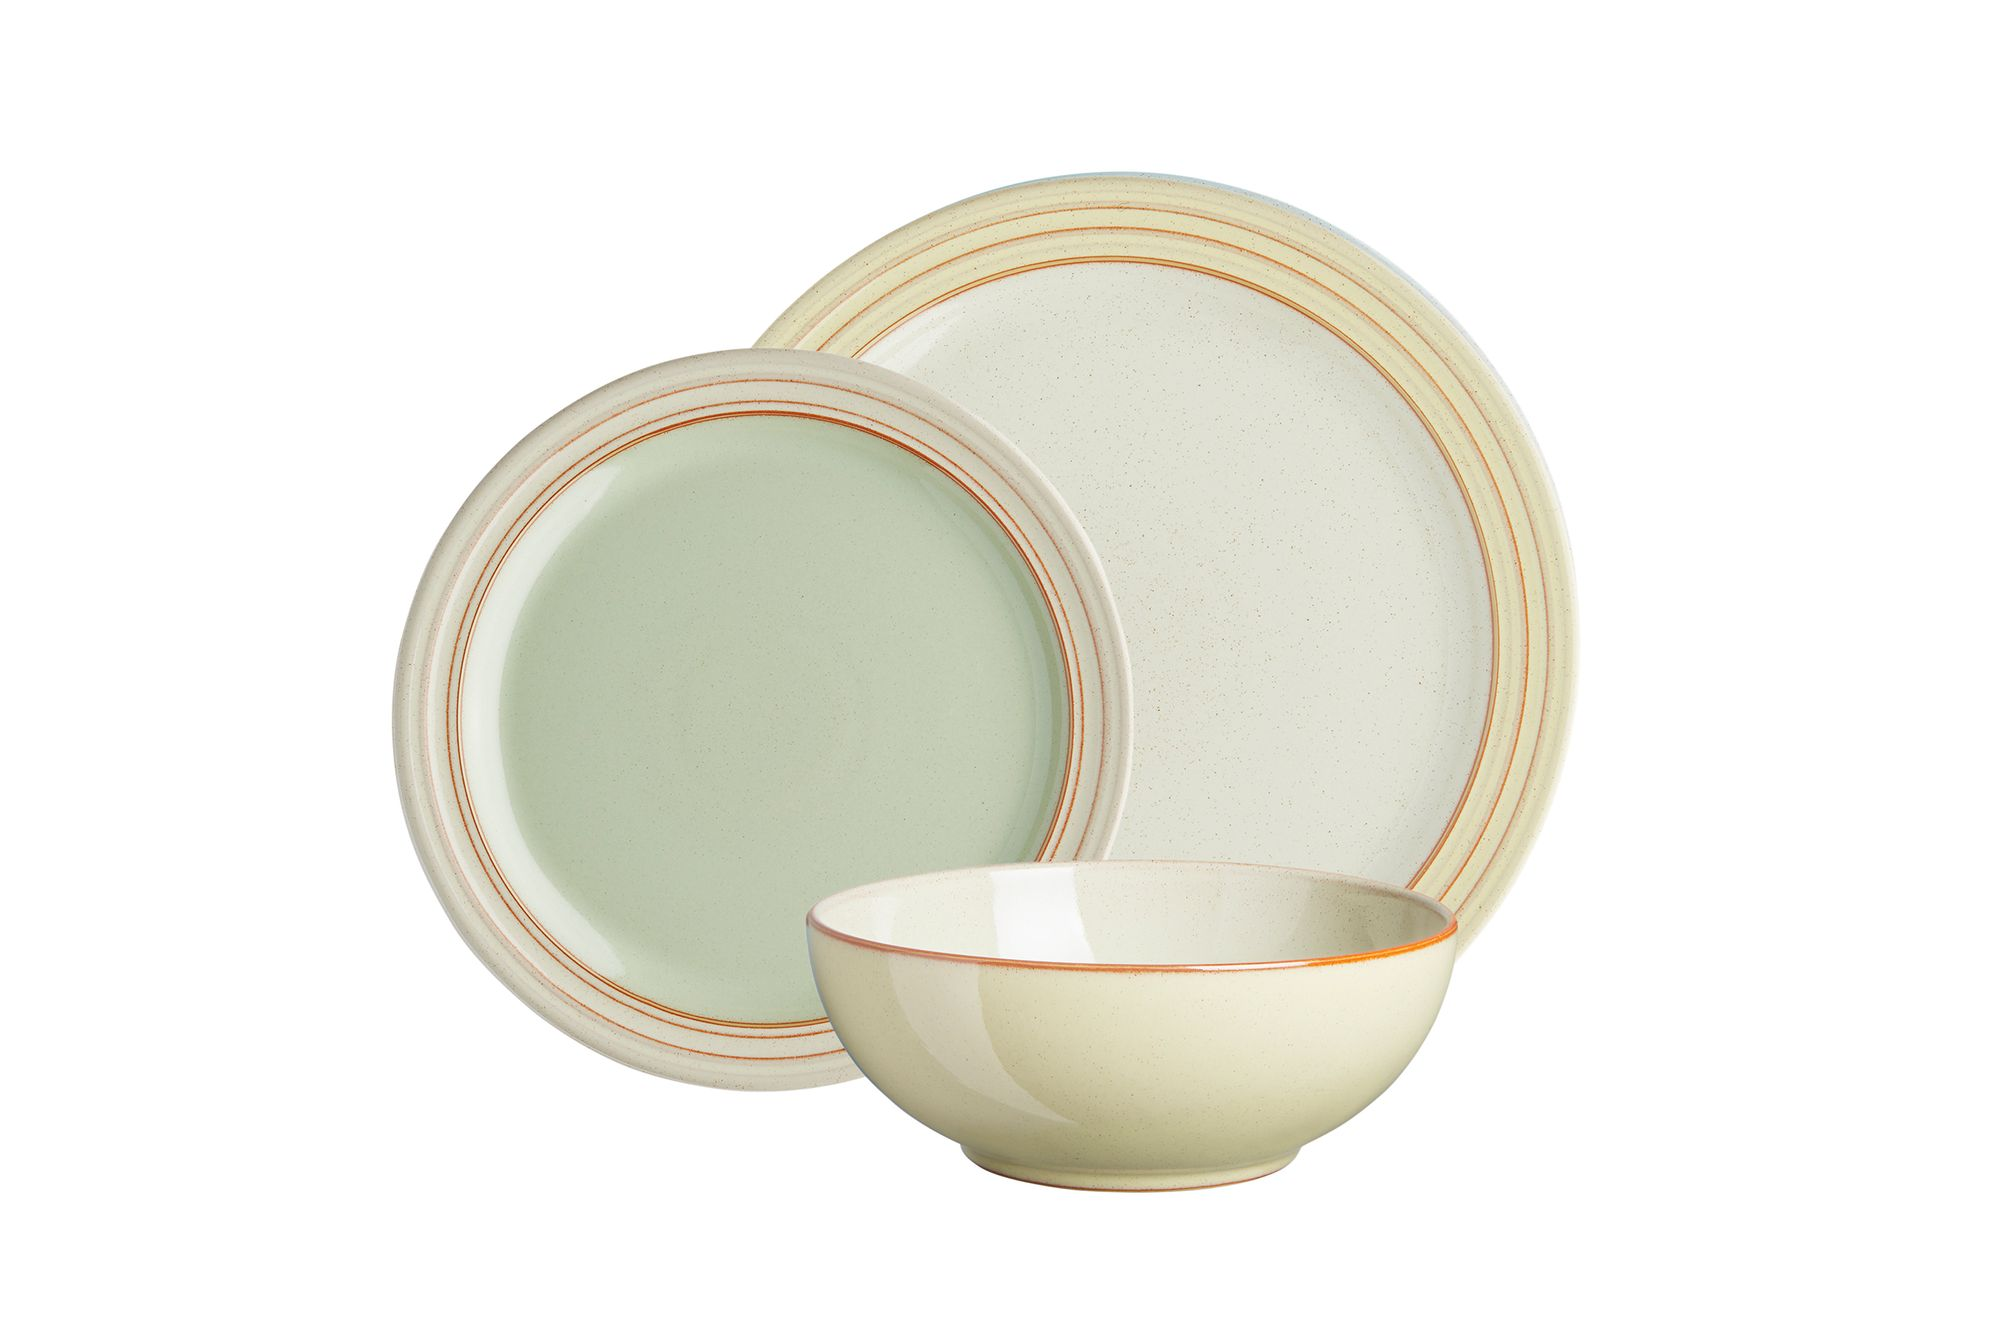 Denby Heritage Veranda 12 Piece Set 4 x Dinner Plate, 4 x Medium Plate, 4 x Cereal Bowl thumb 1